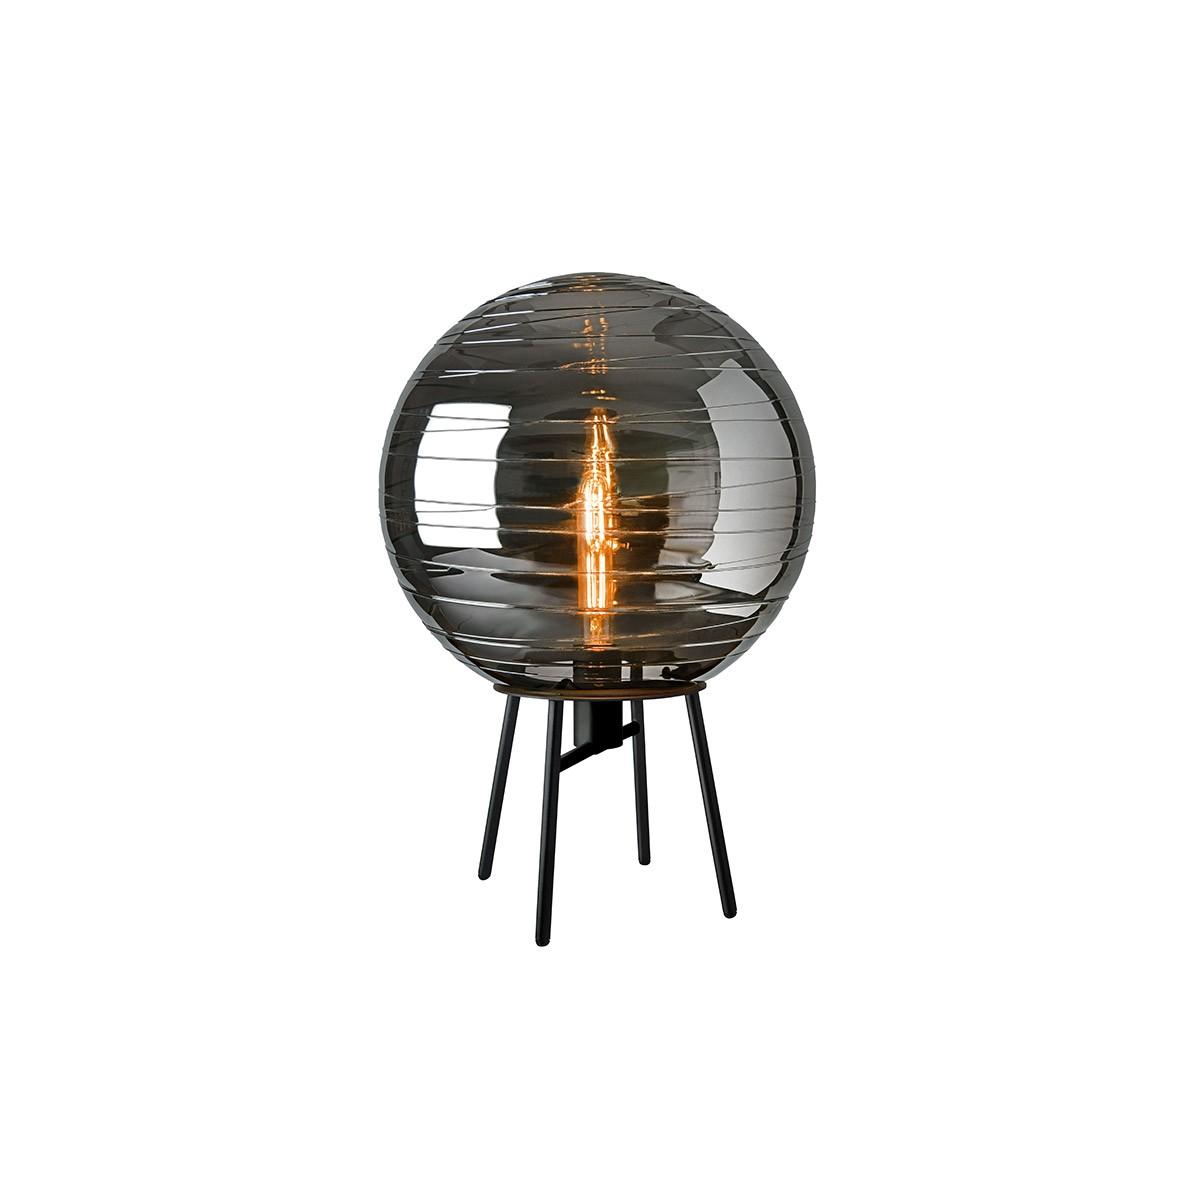 Sompex Lantaren Tischleuchte, Glas: smoke (grau)